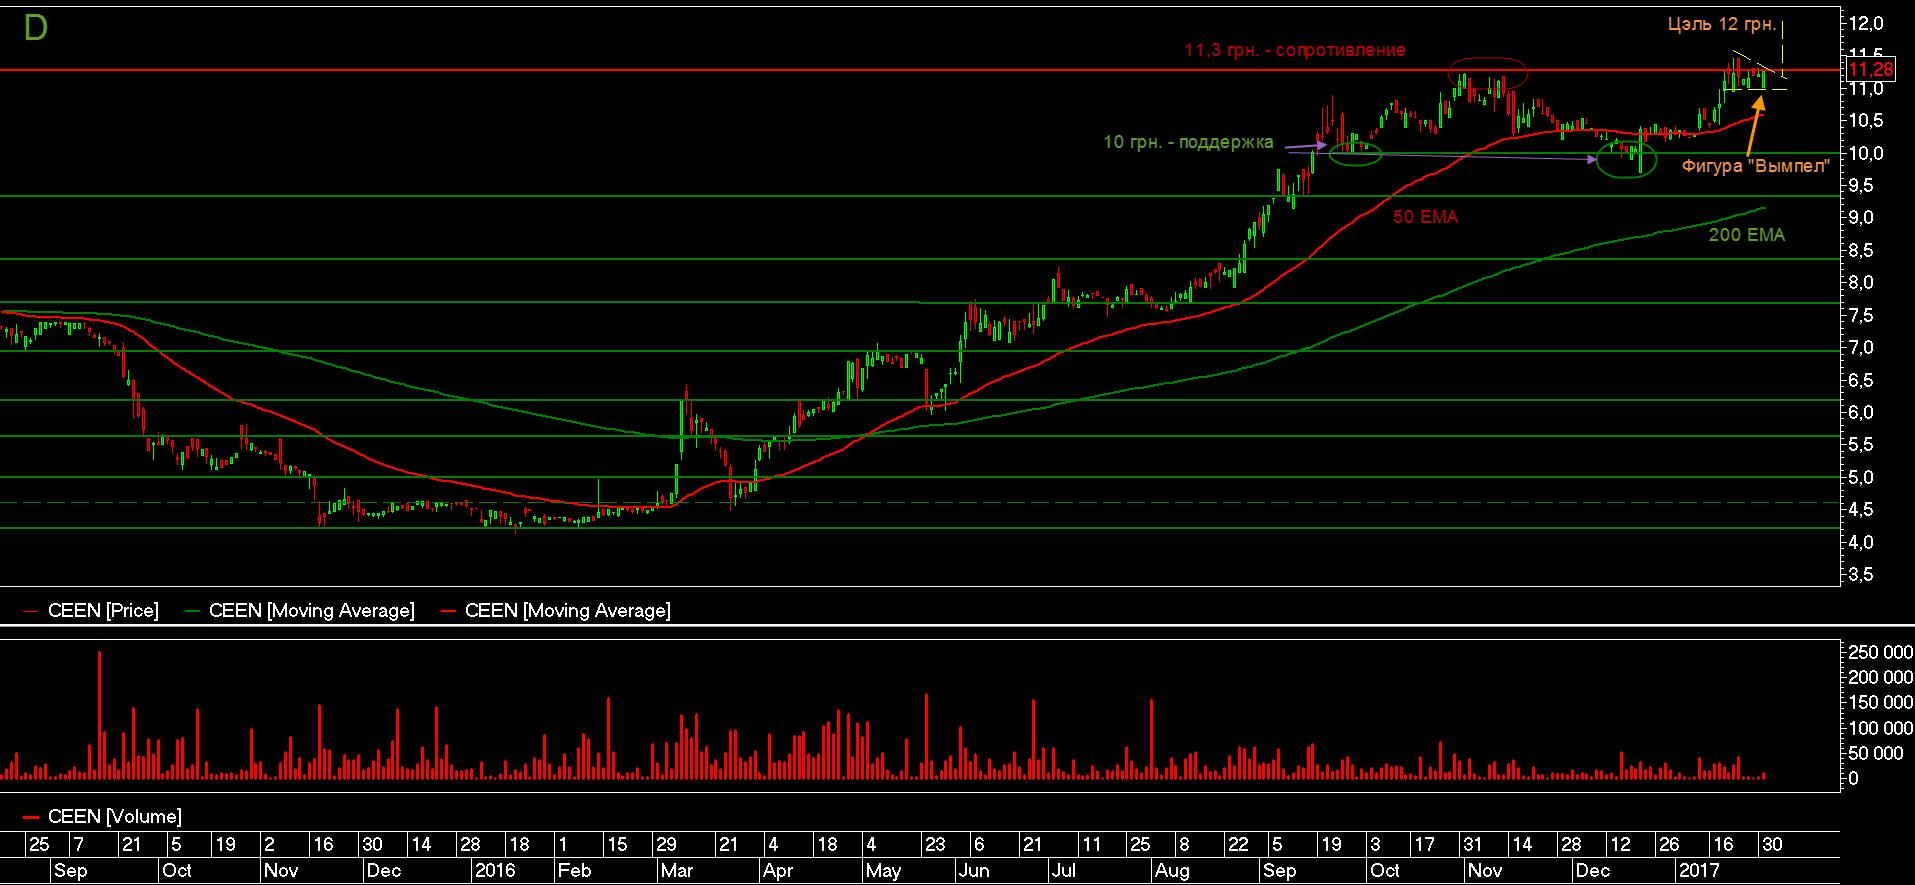 Цена акций Центрэнерго